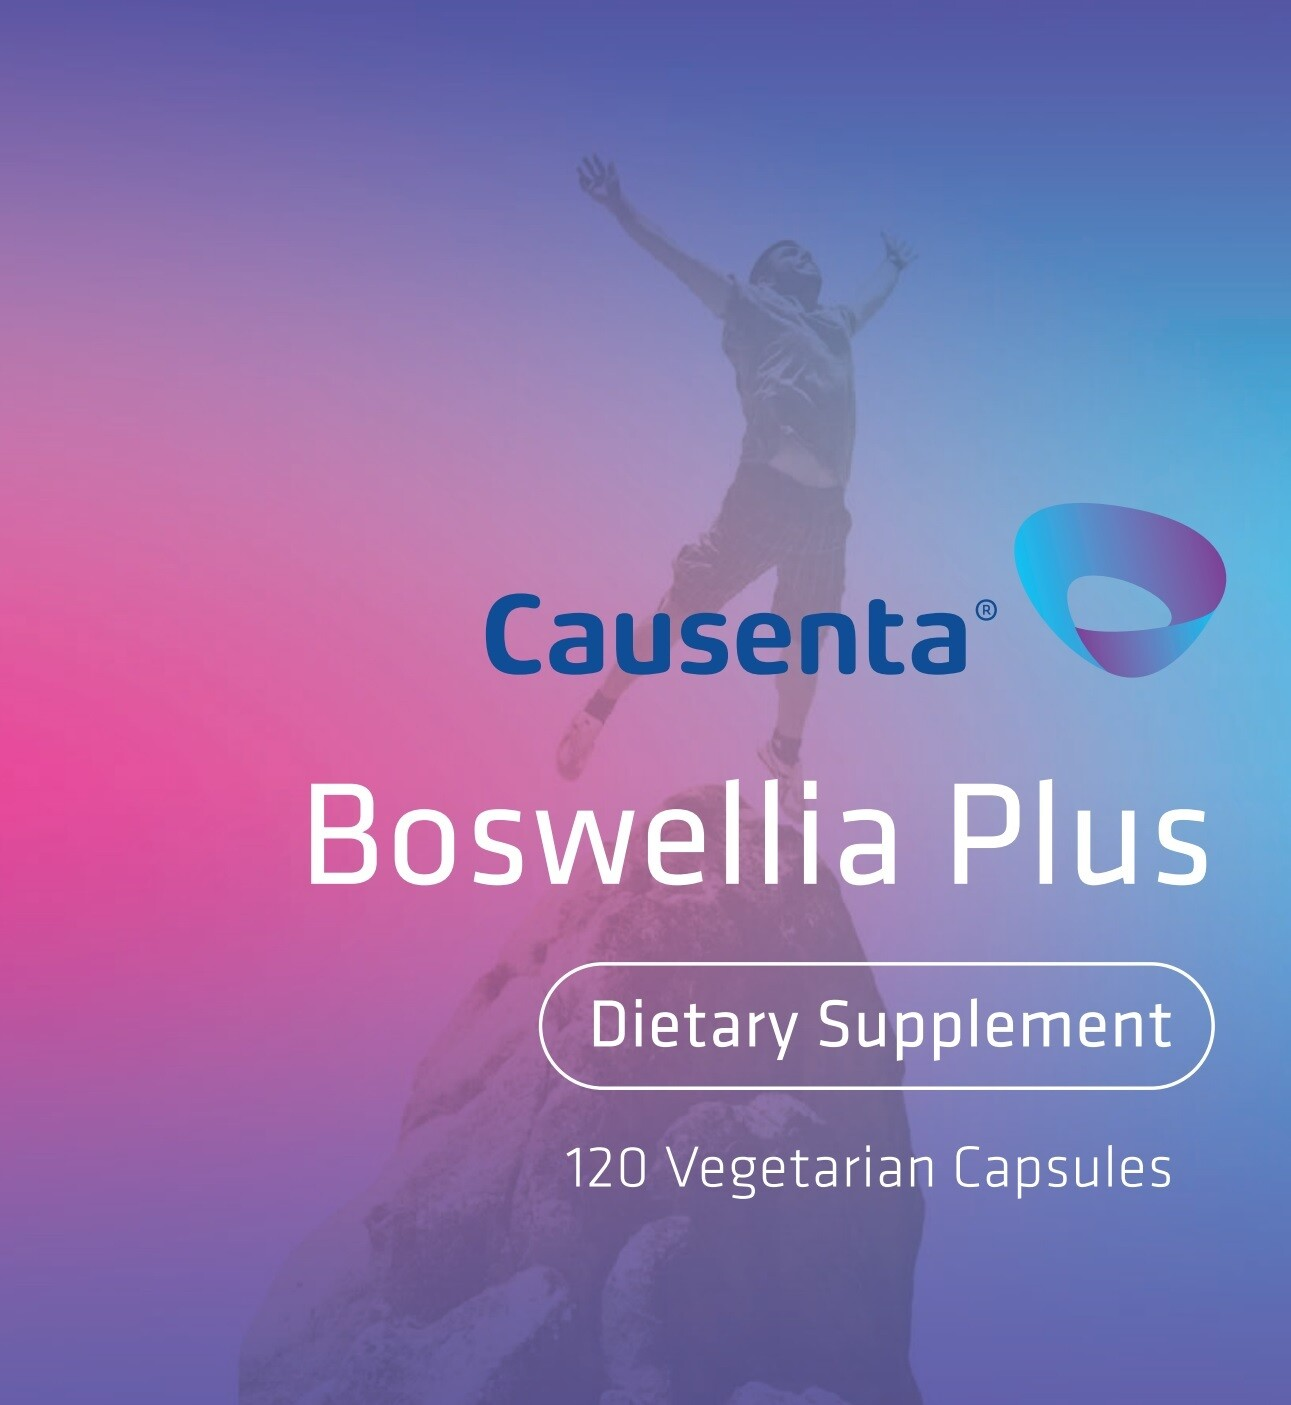 Boswellia Plus -Salicin and Boswellia